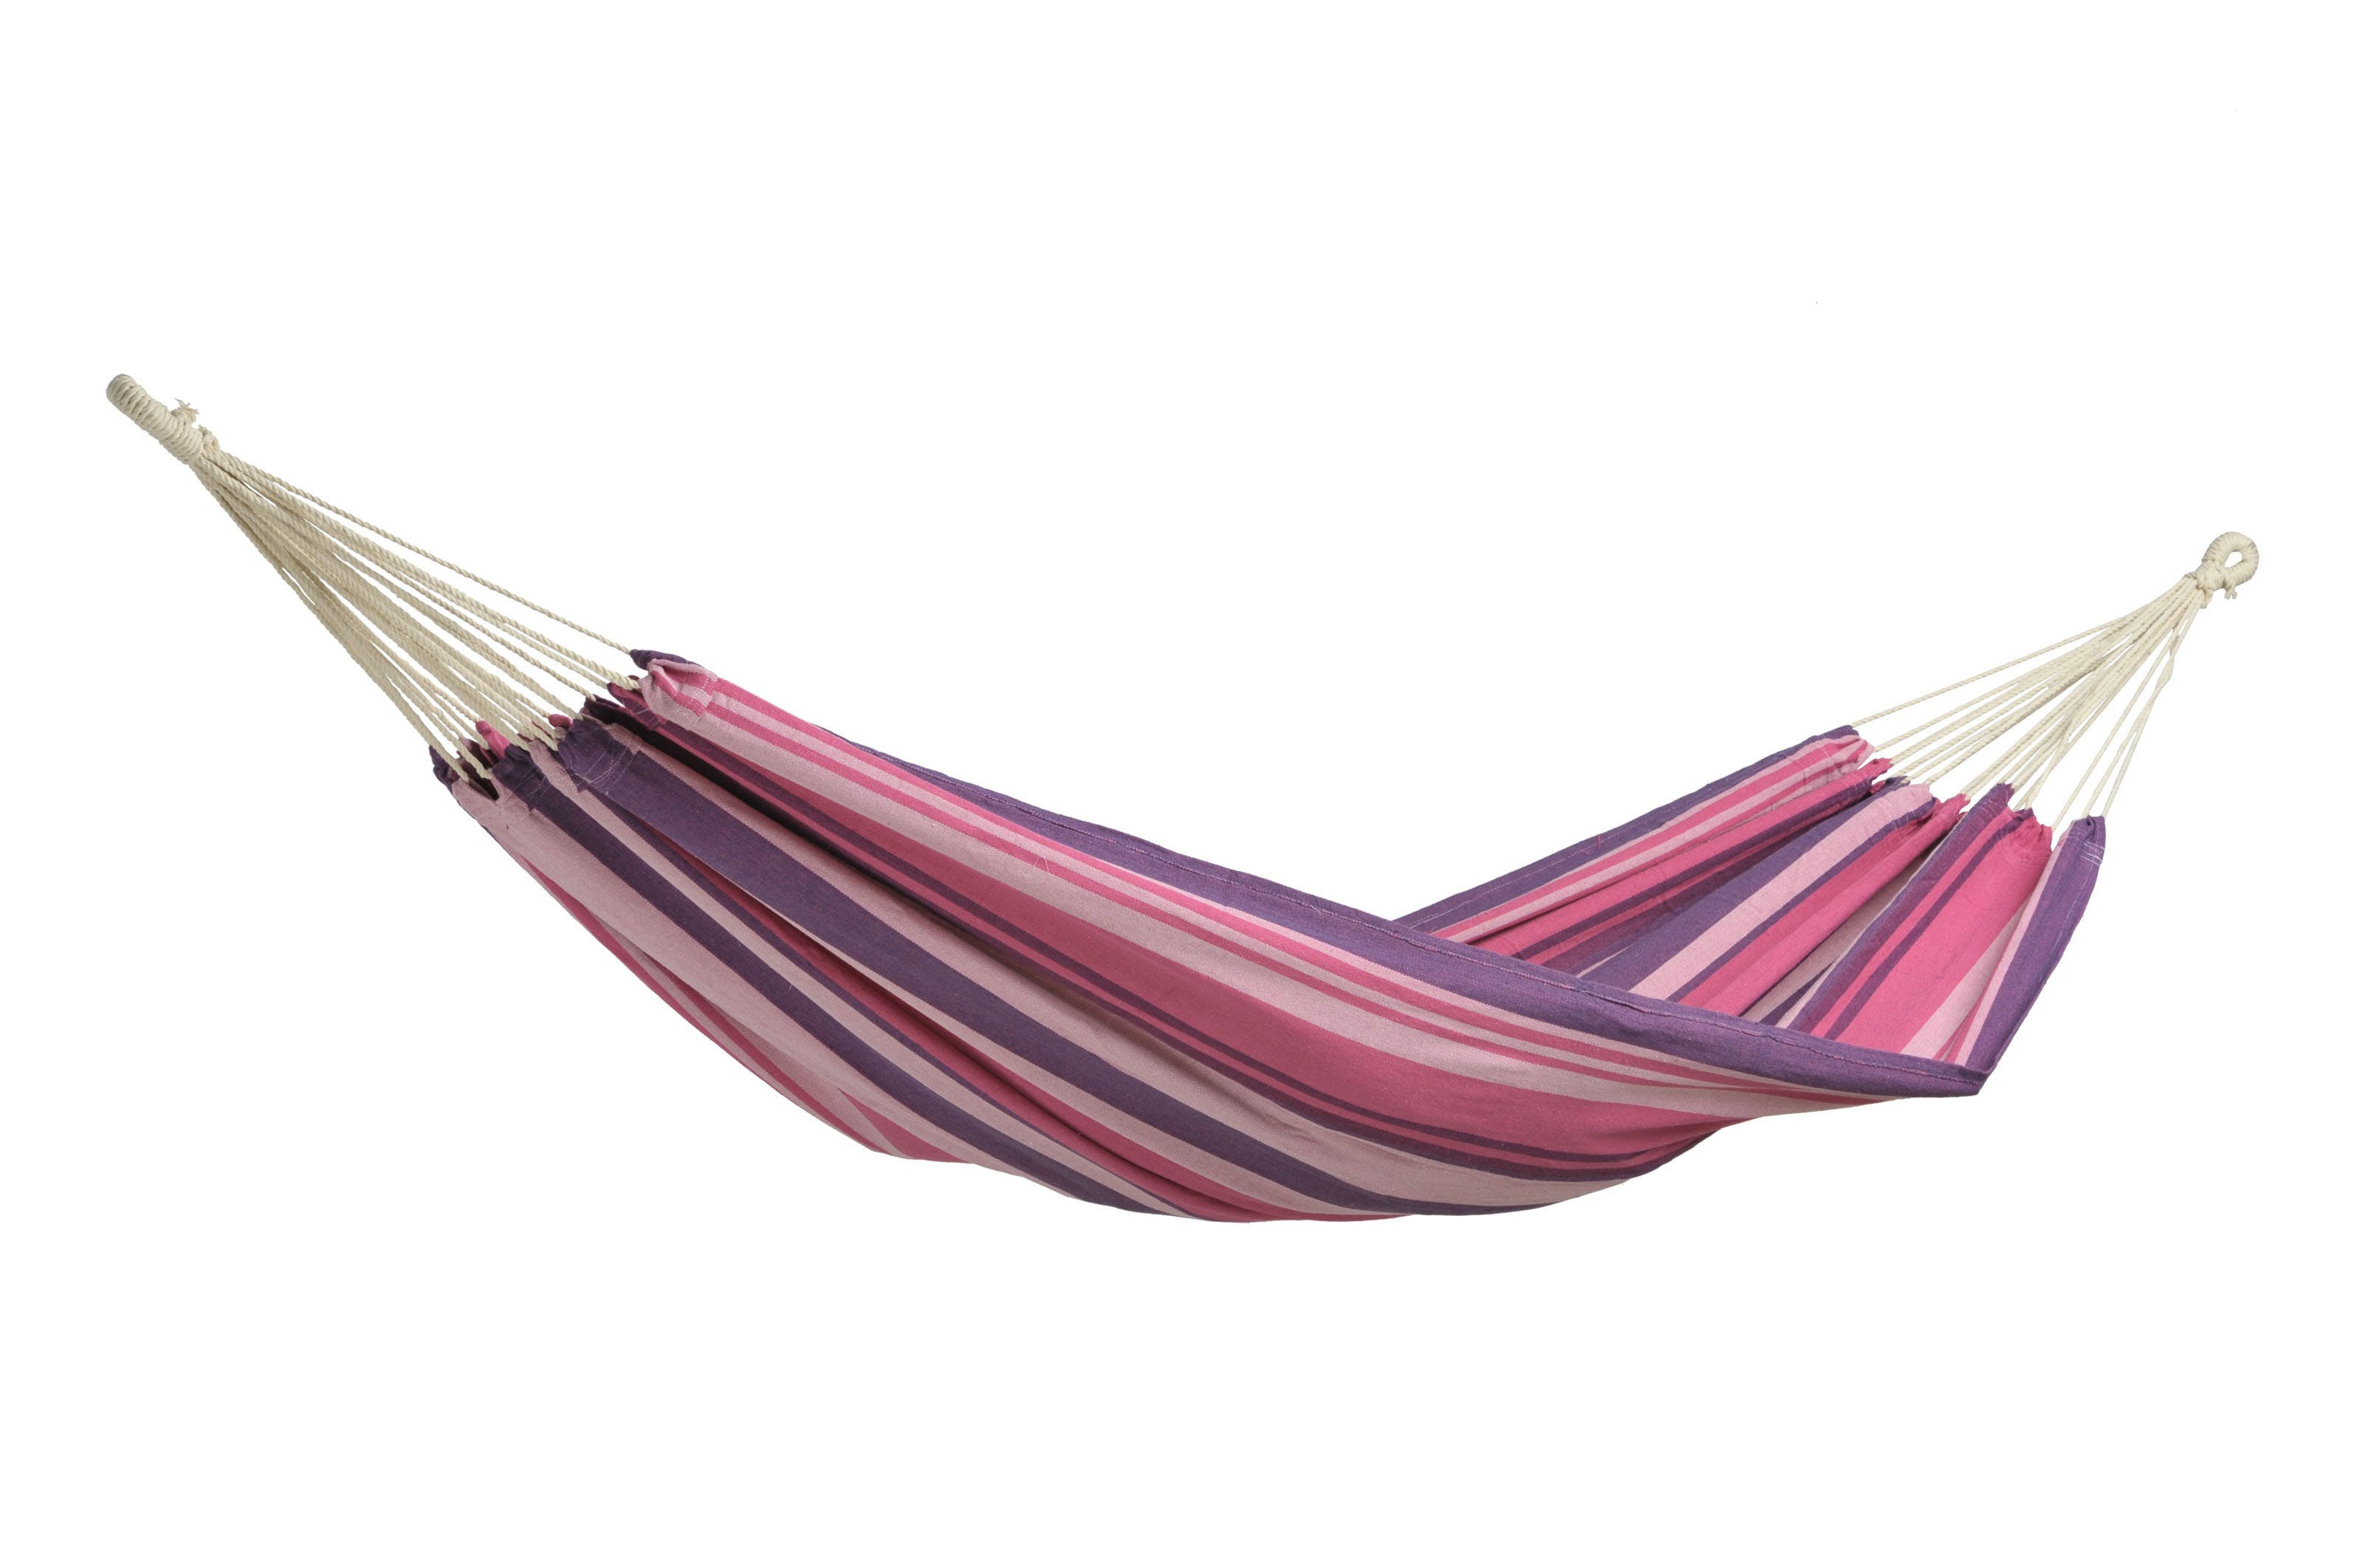 Hamac de jardin XL TAHITI Candy Rose violet 200x100cm AMAZONAS